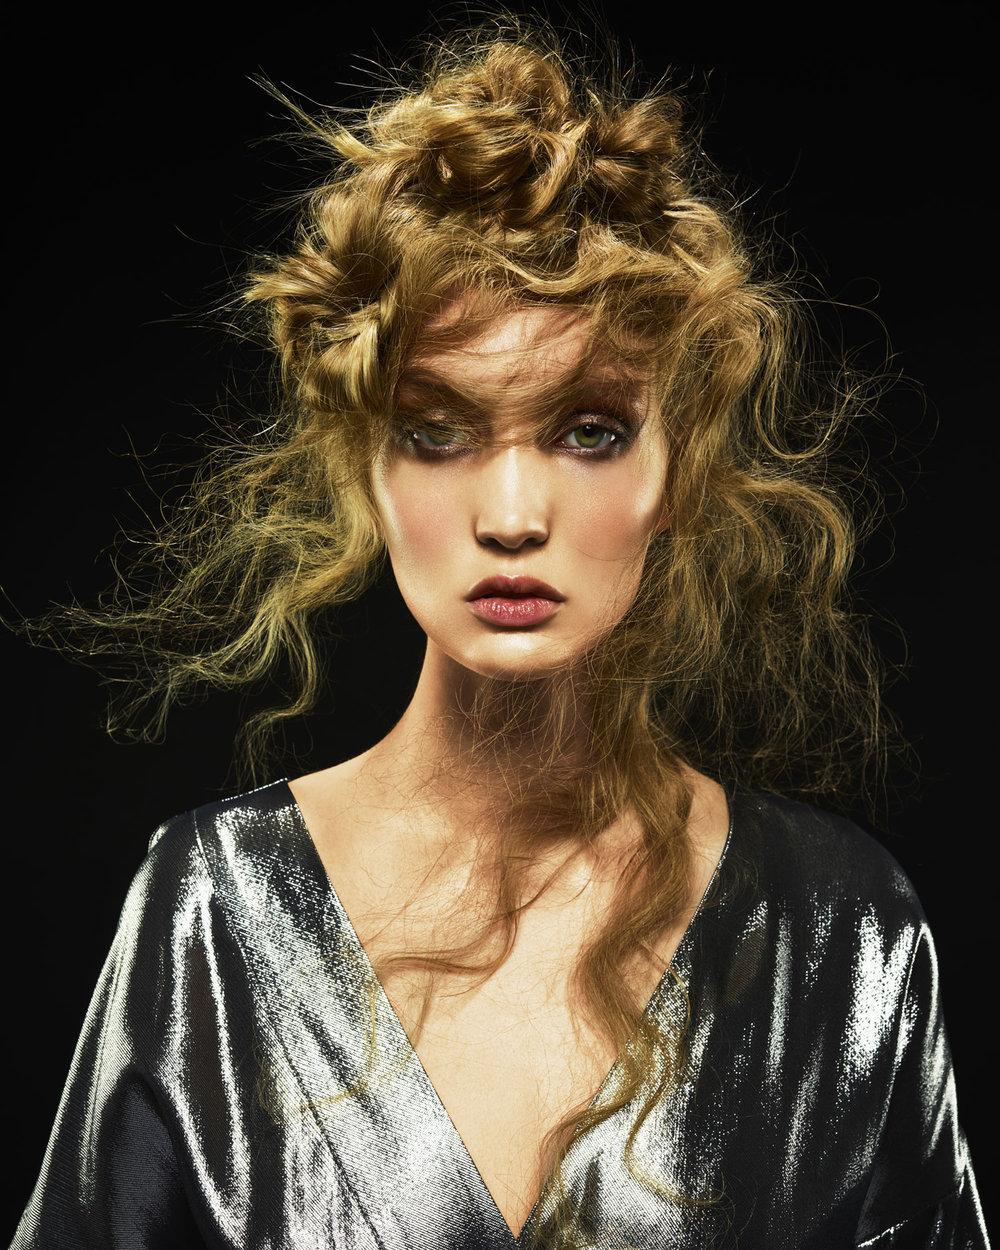 sarah-cochran-wardrobe-stylist-minneapolis-st-paul-creative-stylist-3.jpg